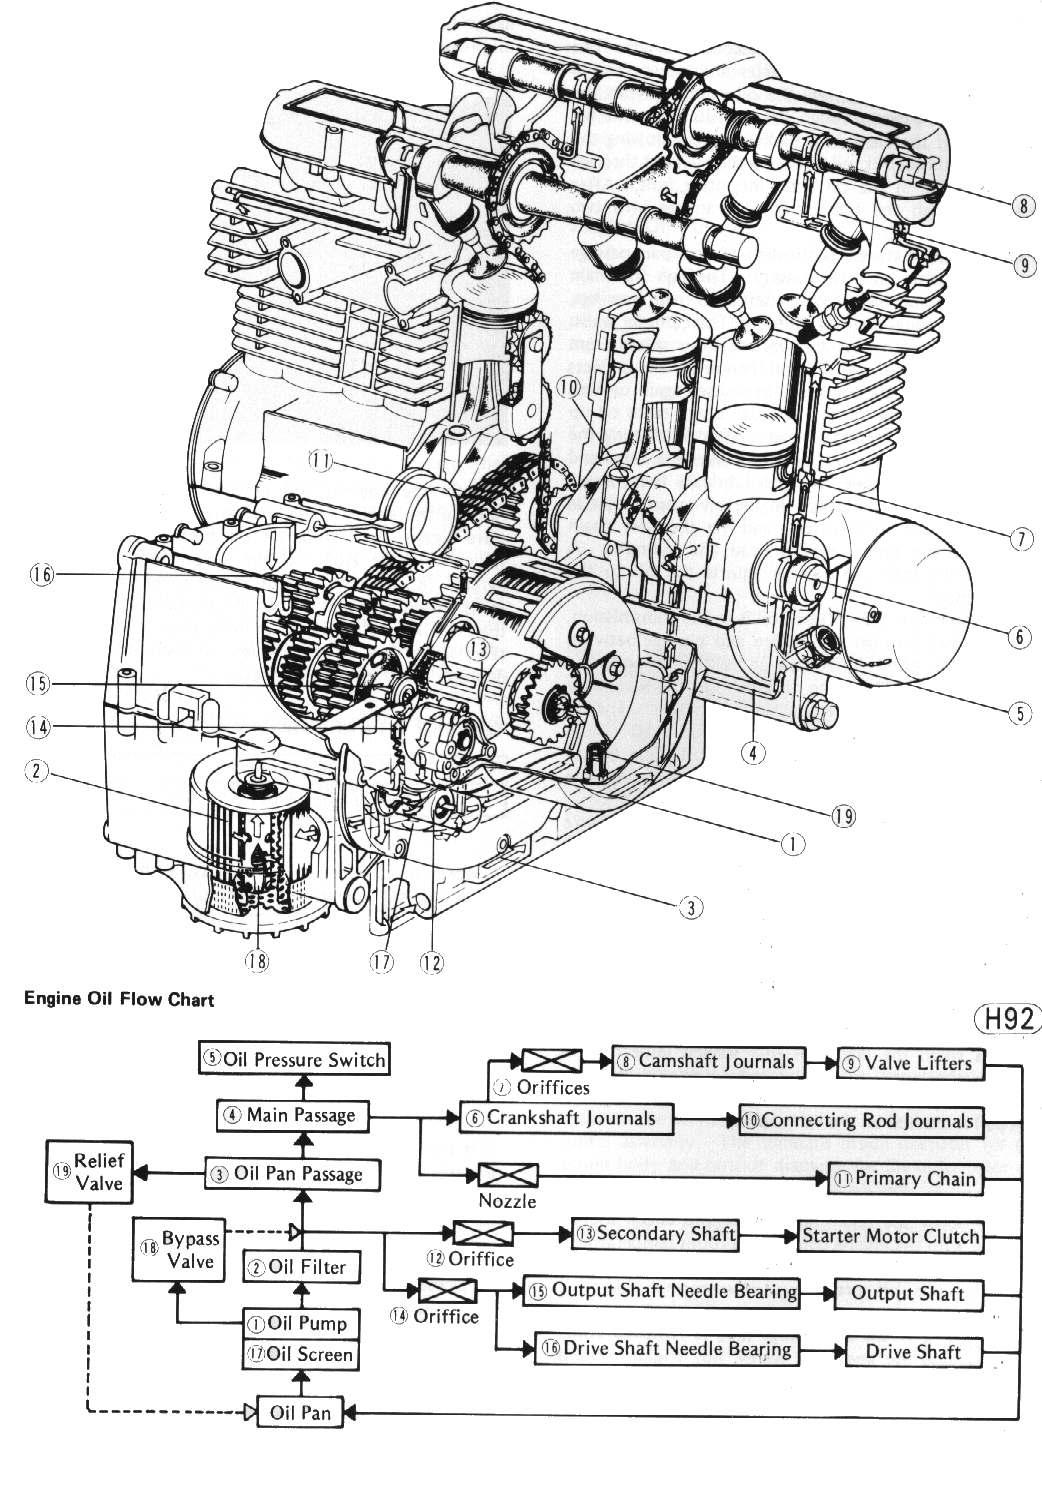 tags: #1993 kawasaki kz1000 police wiring diagram#78 kawasaki kz650  specs#1977 kawasaki kz650 specs#1978 kawasaki kz650 seat#1978 kawasaki 750  wiring